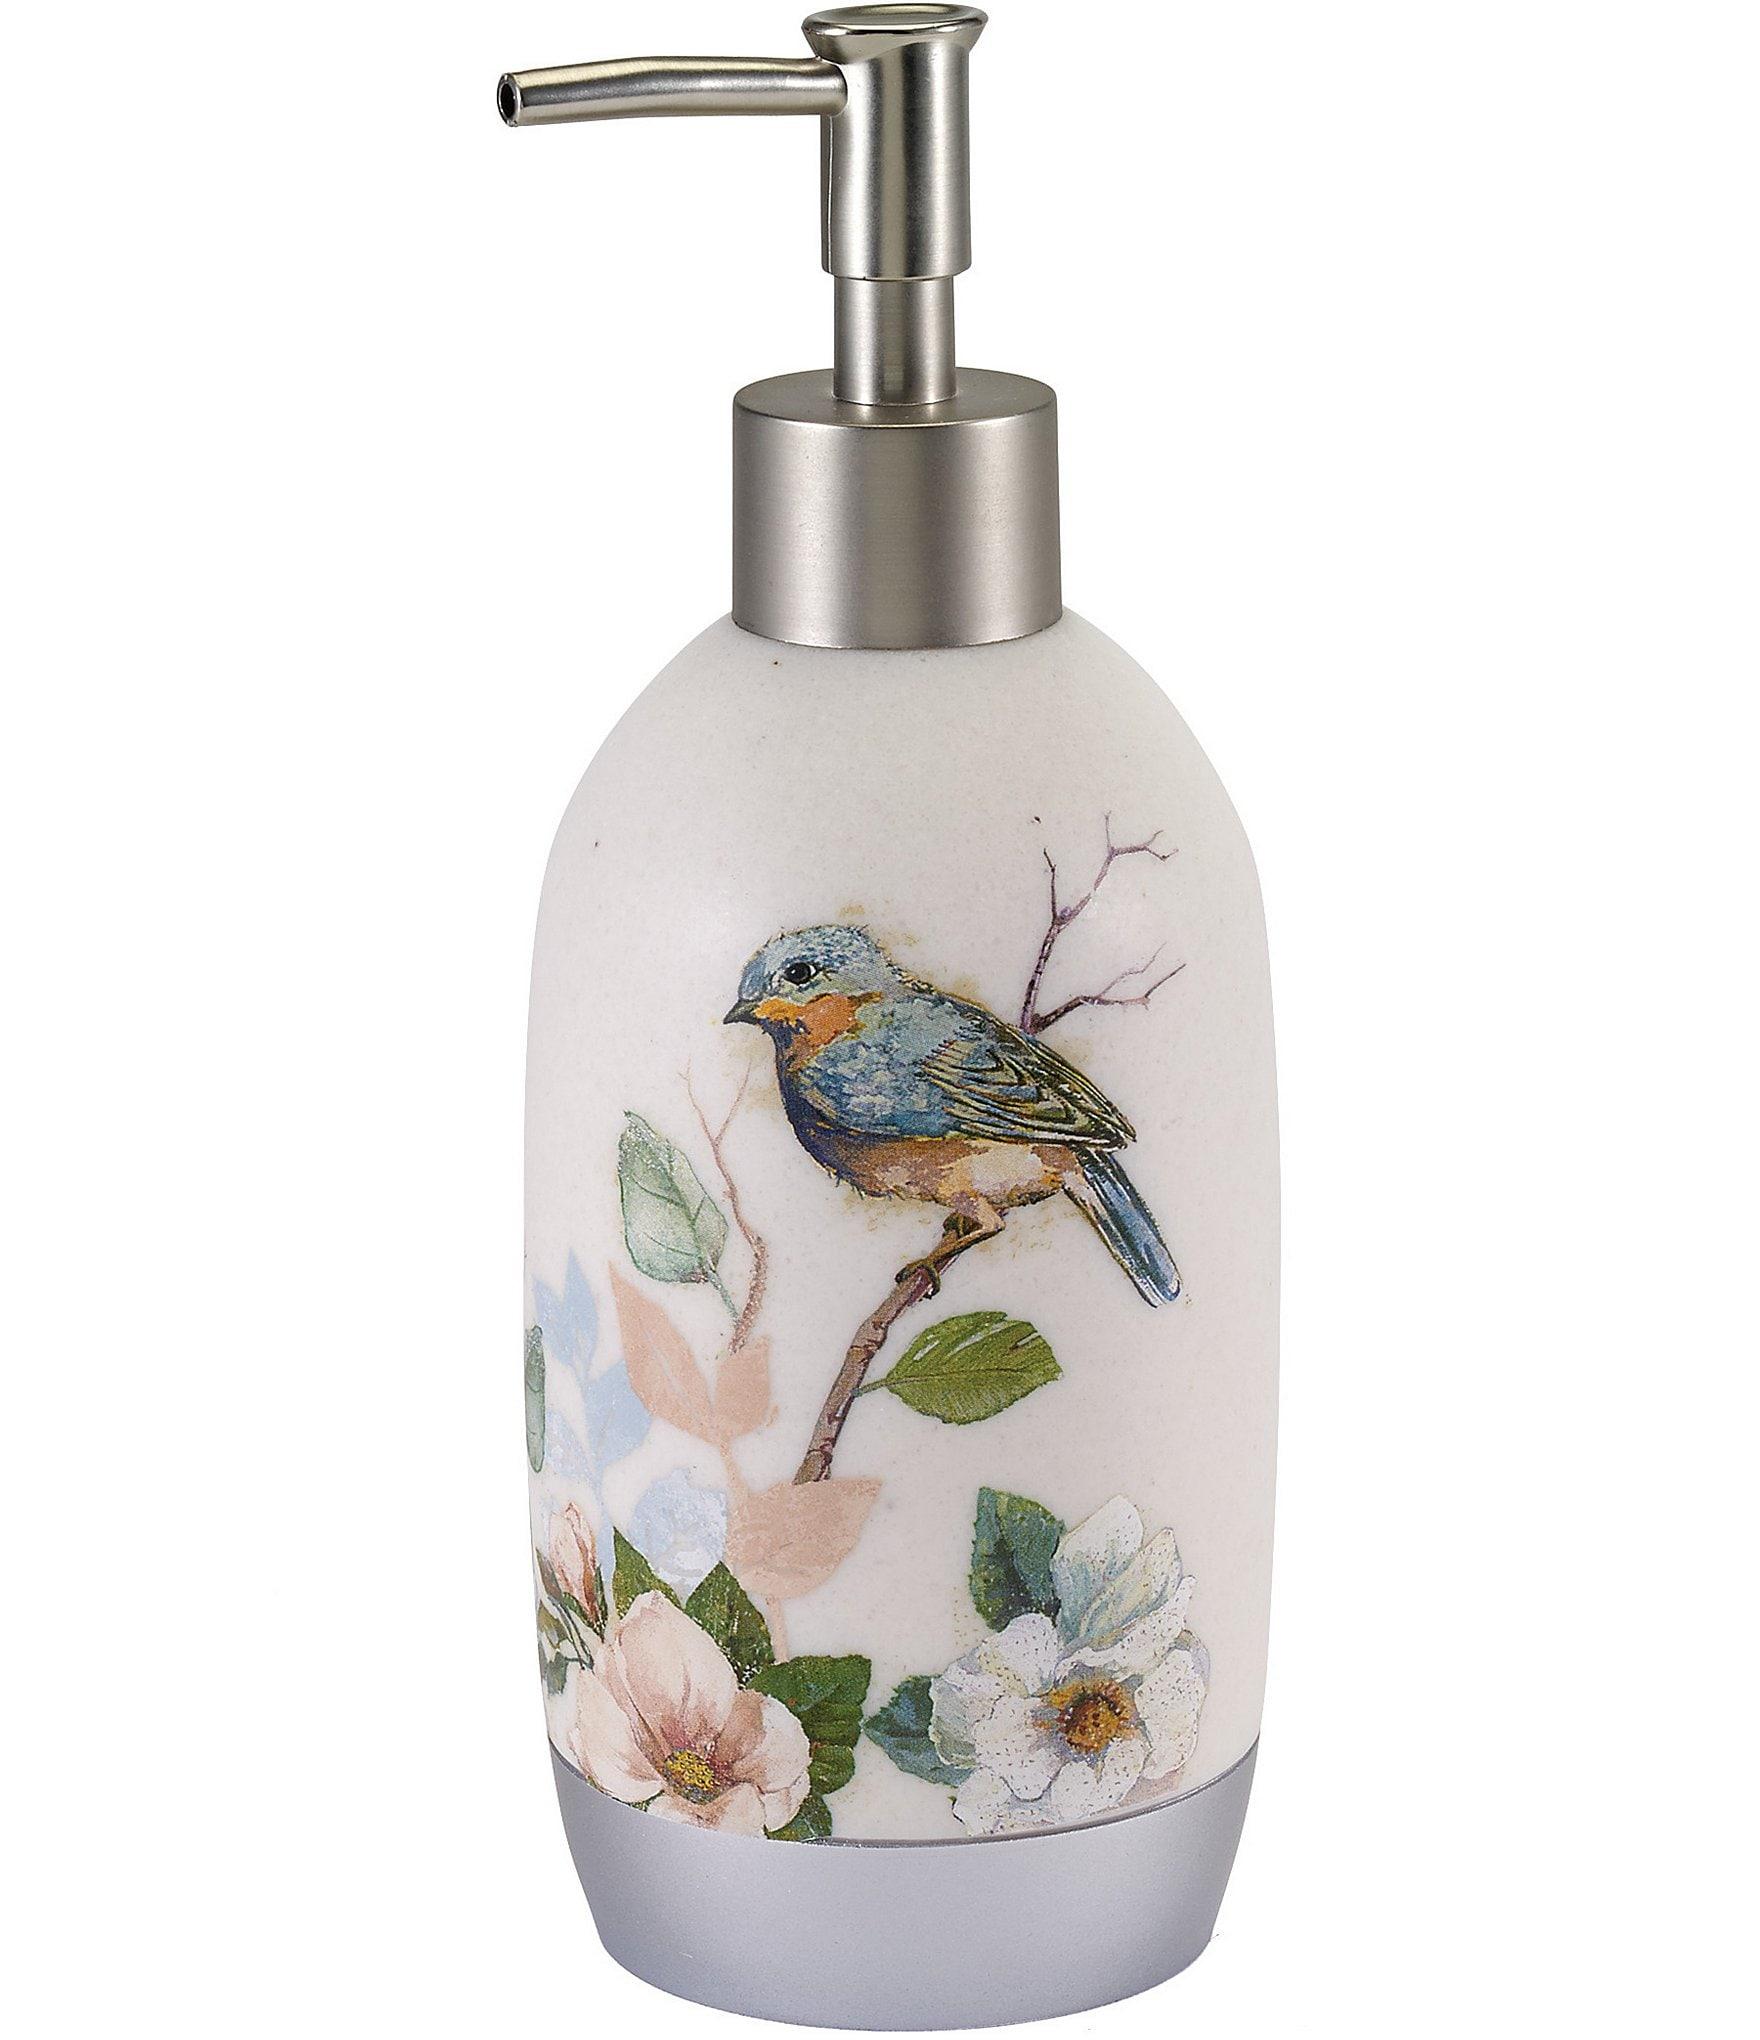 Home | Bath & Personal Care | Bath Accessories | Dillards.com